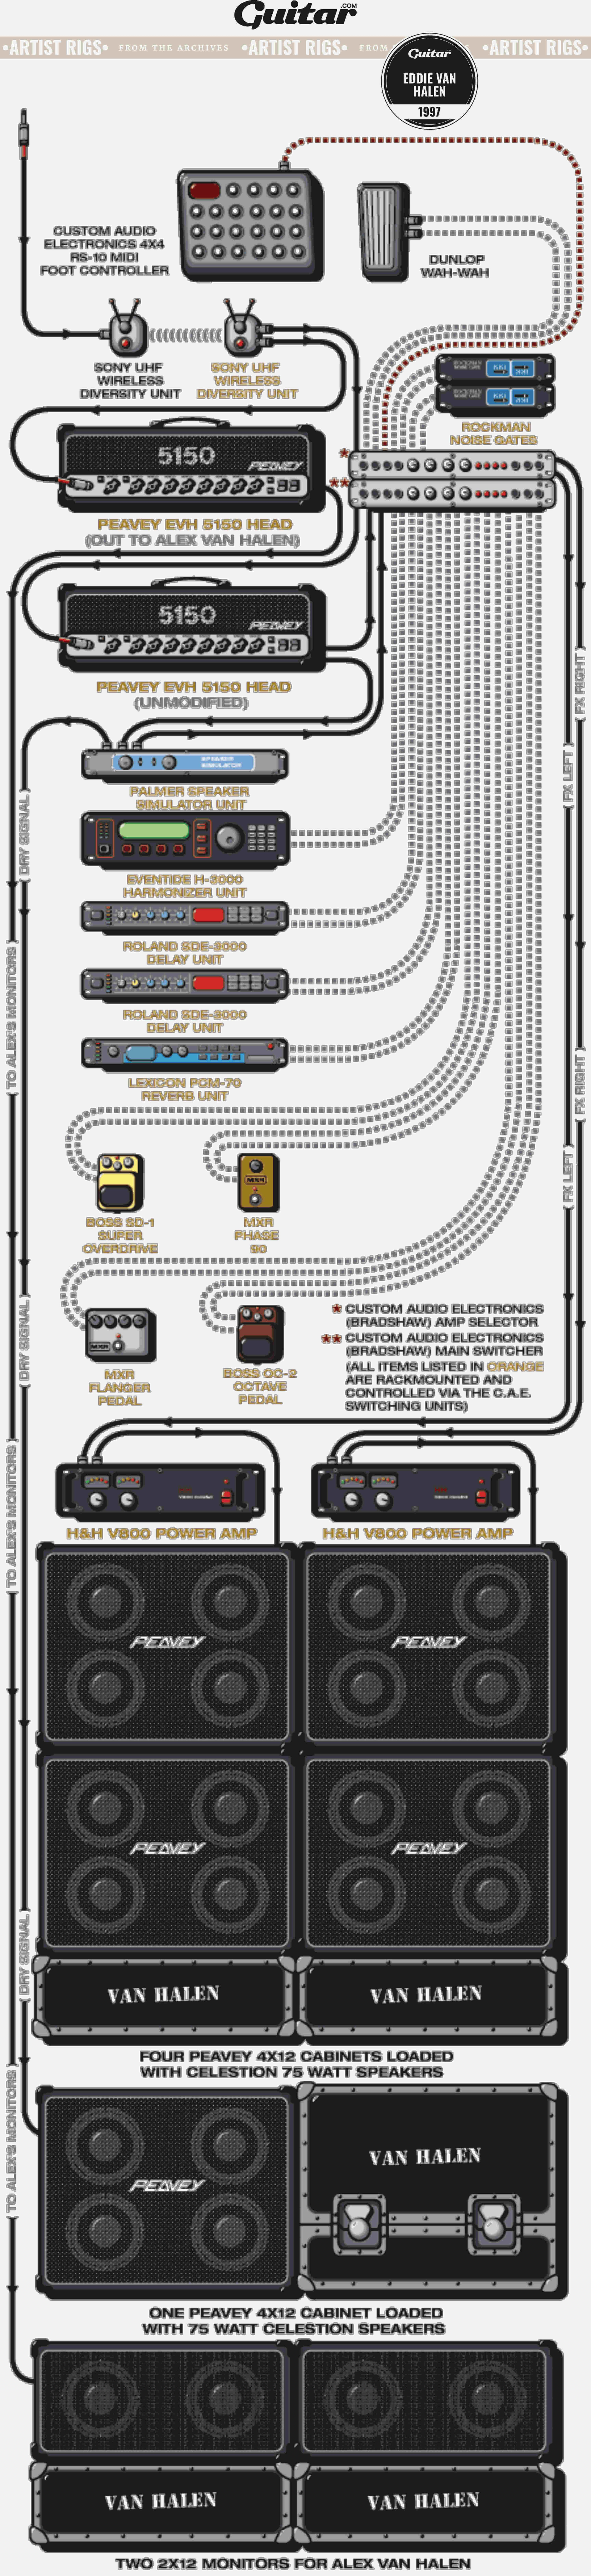 Rig Diagram: Eddie Van Halen (1997)